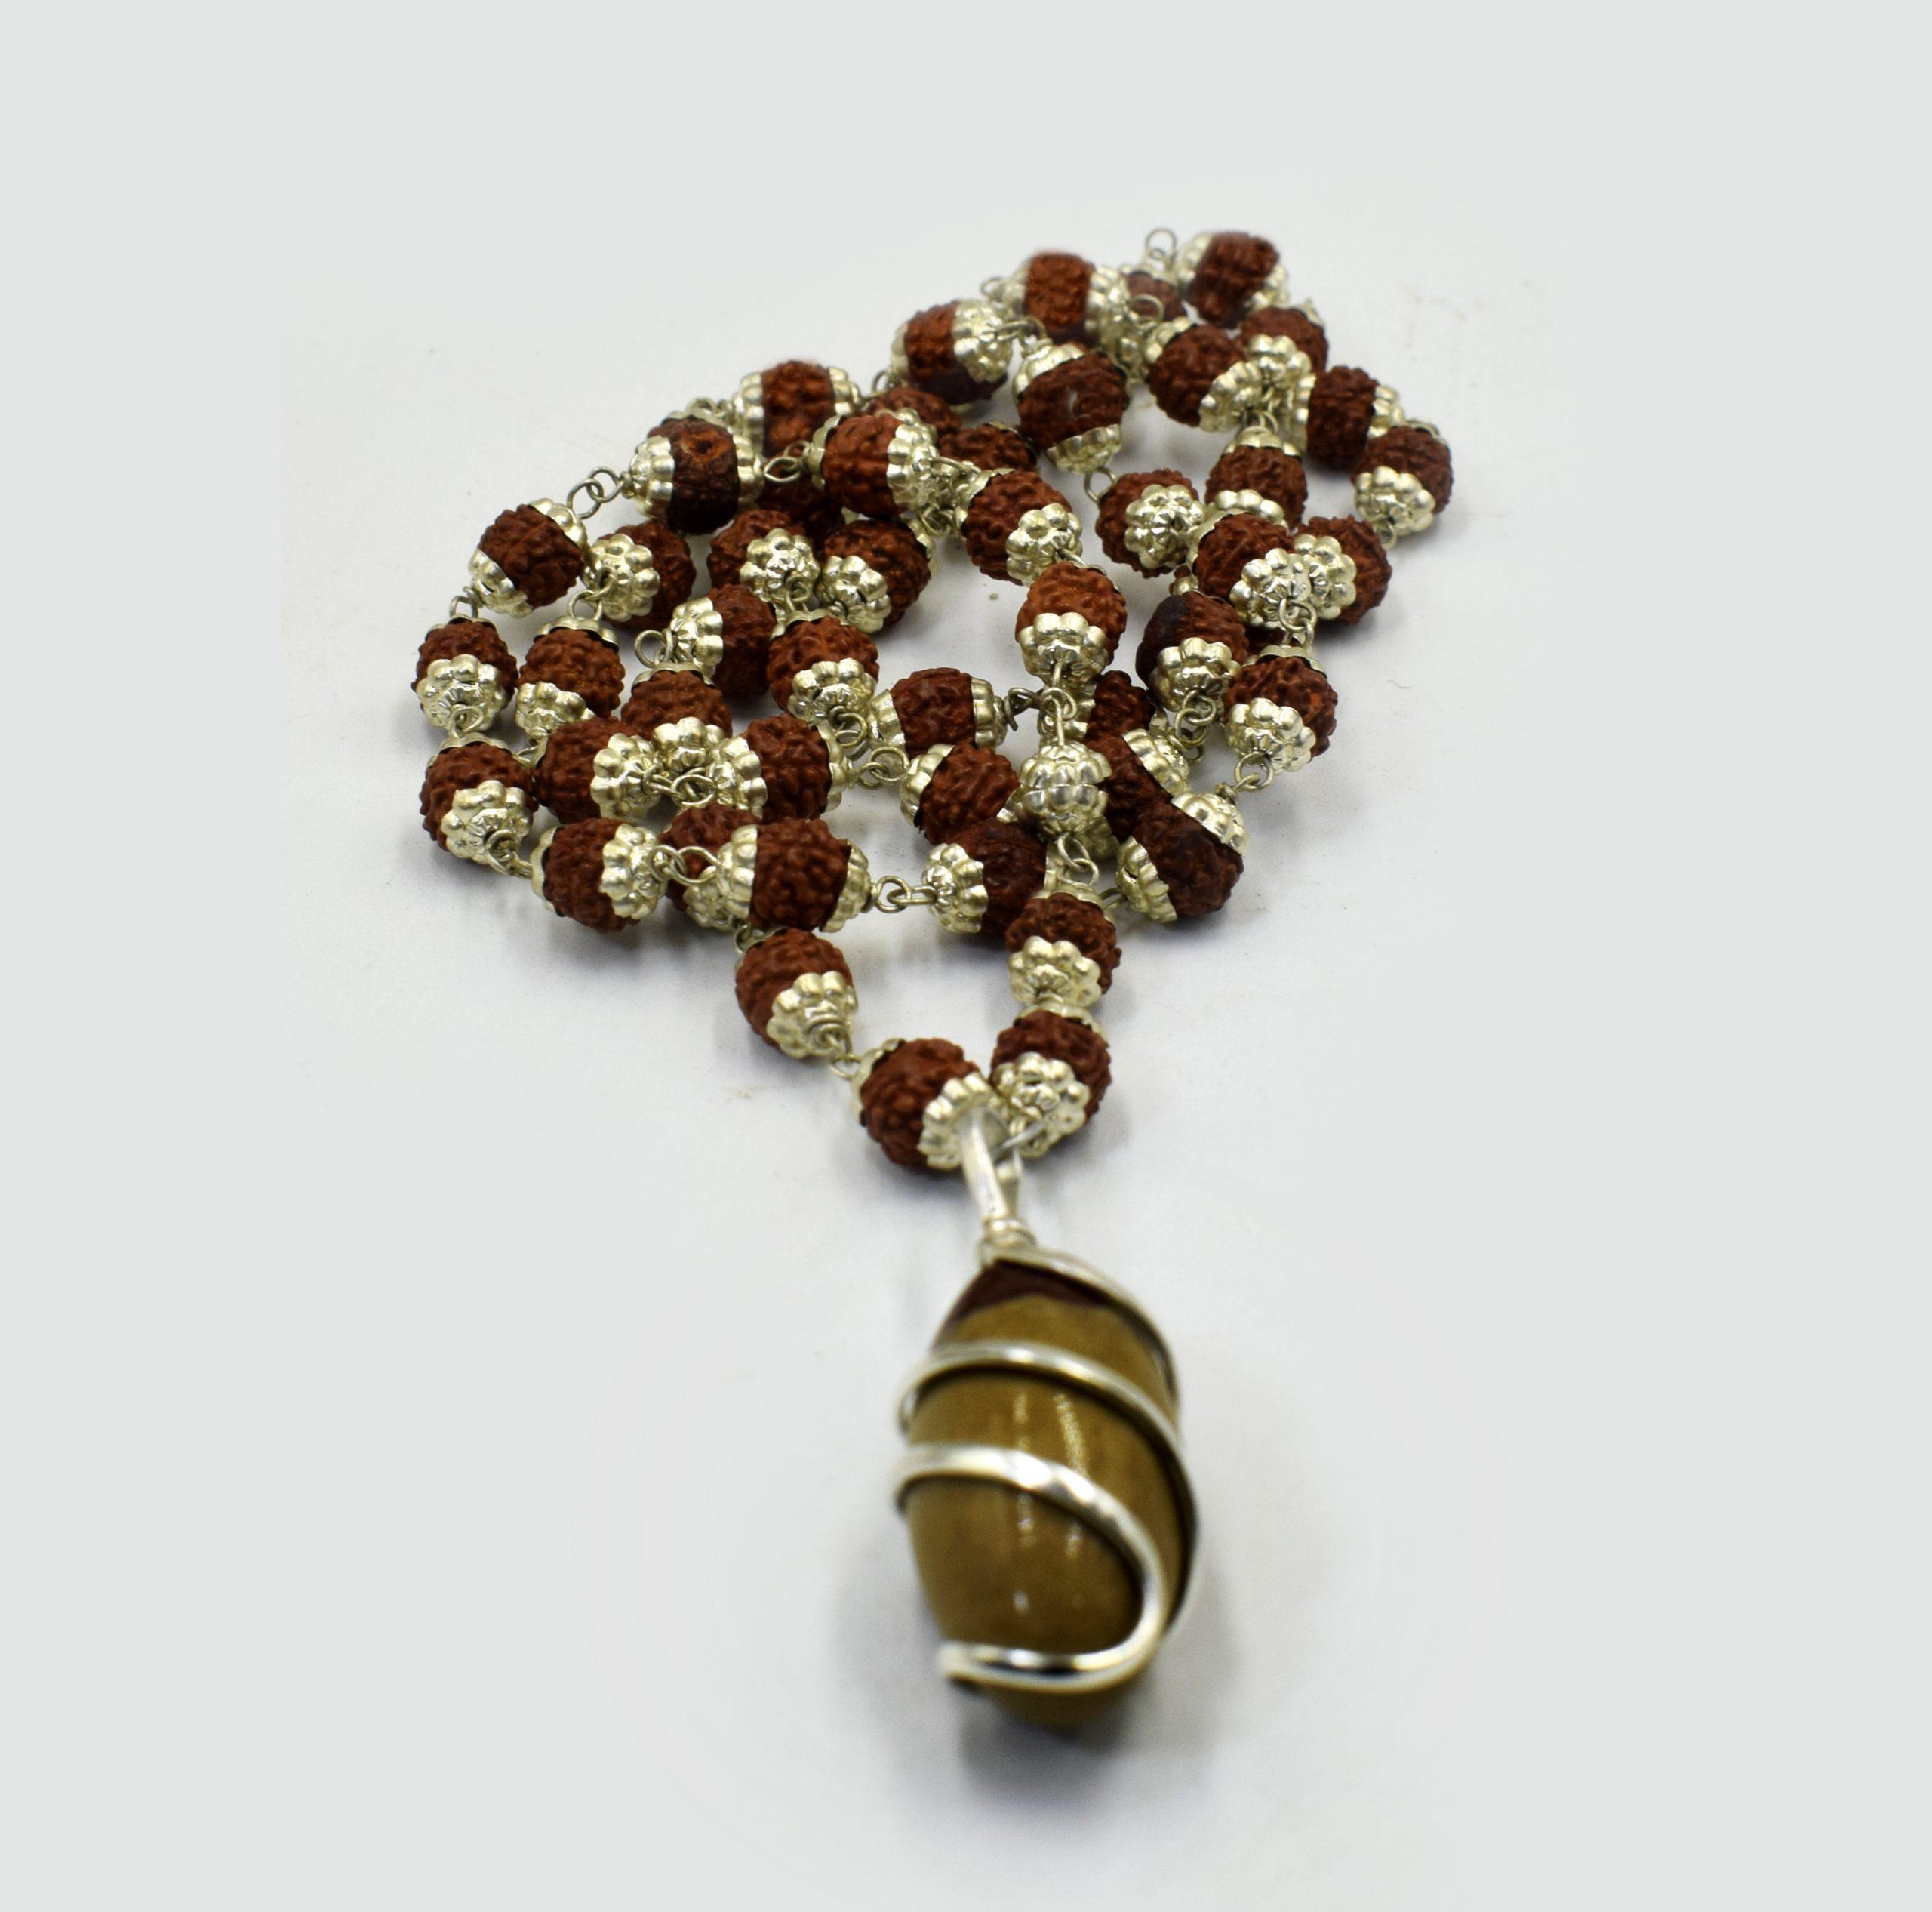 Narmadeshwar Shivling Locket with Silver Capped Panchmukhi Rudraksha Mala